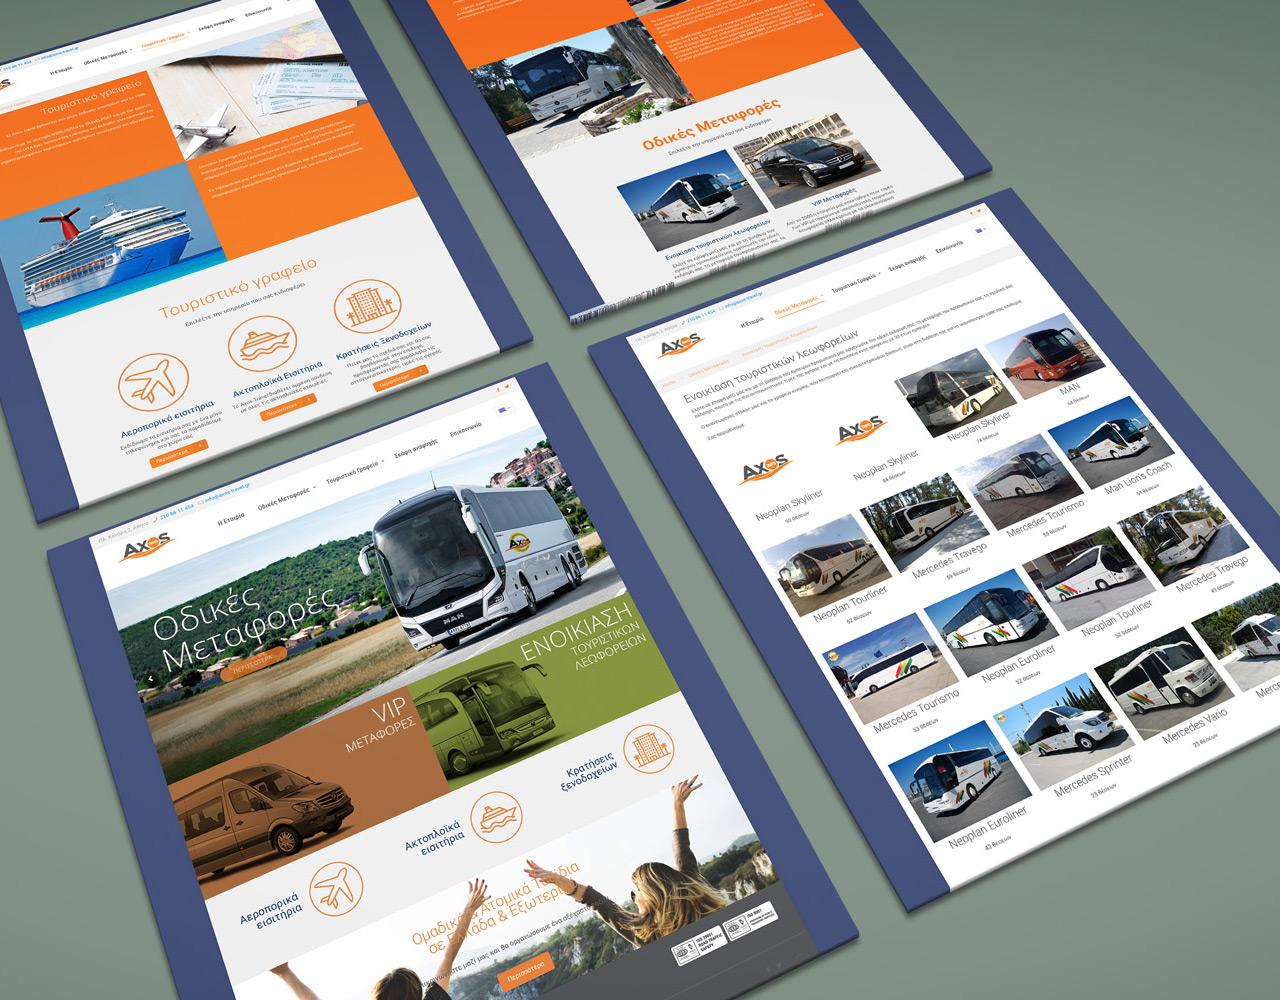 Axos Travel ενοικίαση τουριστικών λεωφορείων, τουριστικό γραφείο κατασκευή ιστοσελίδας